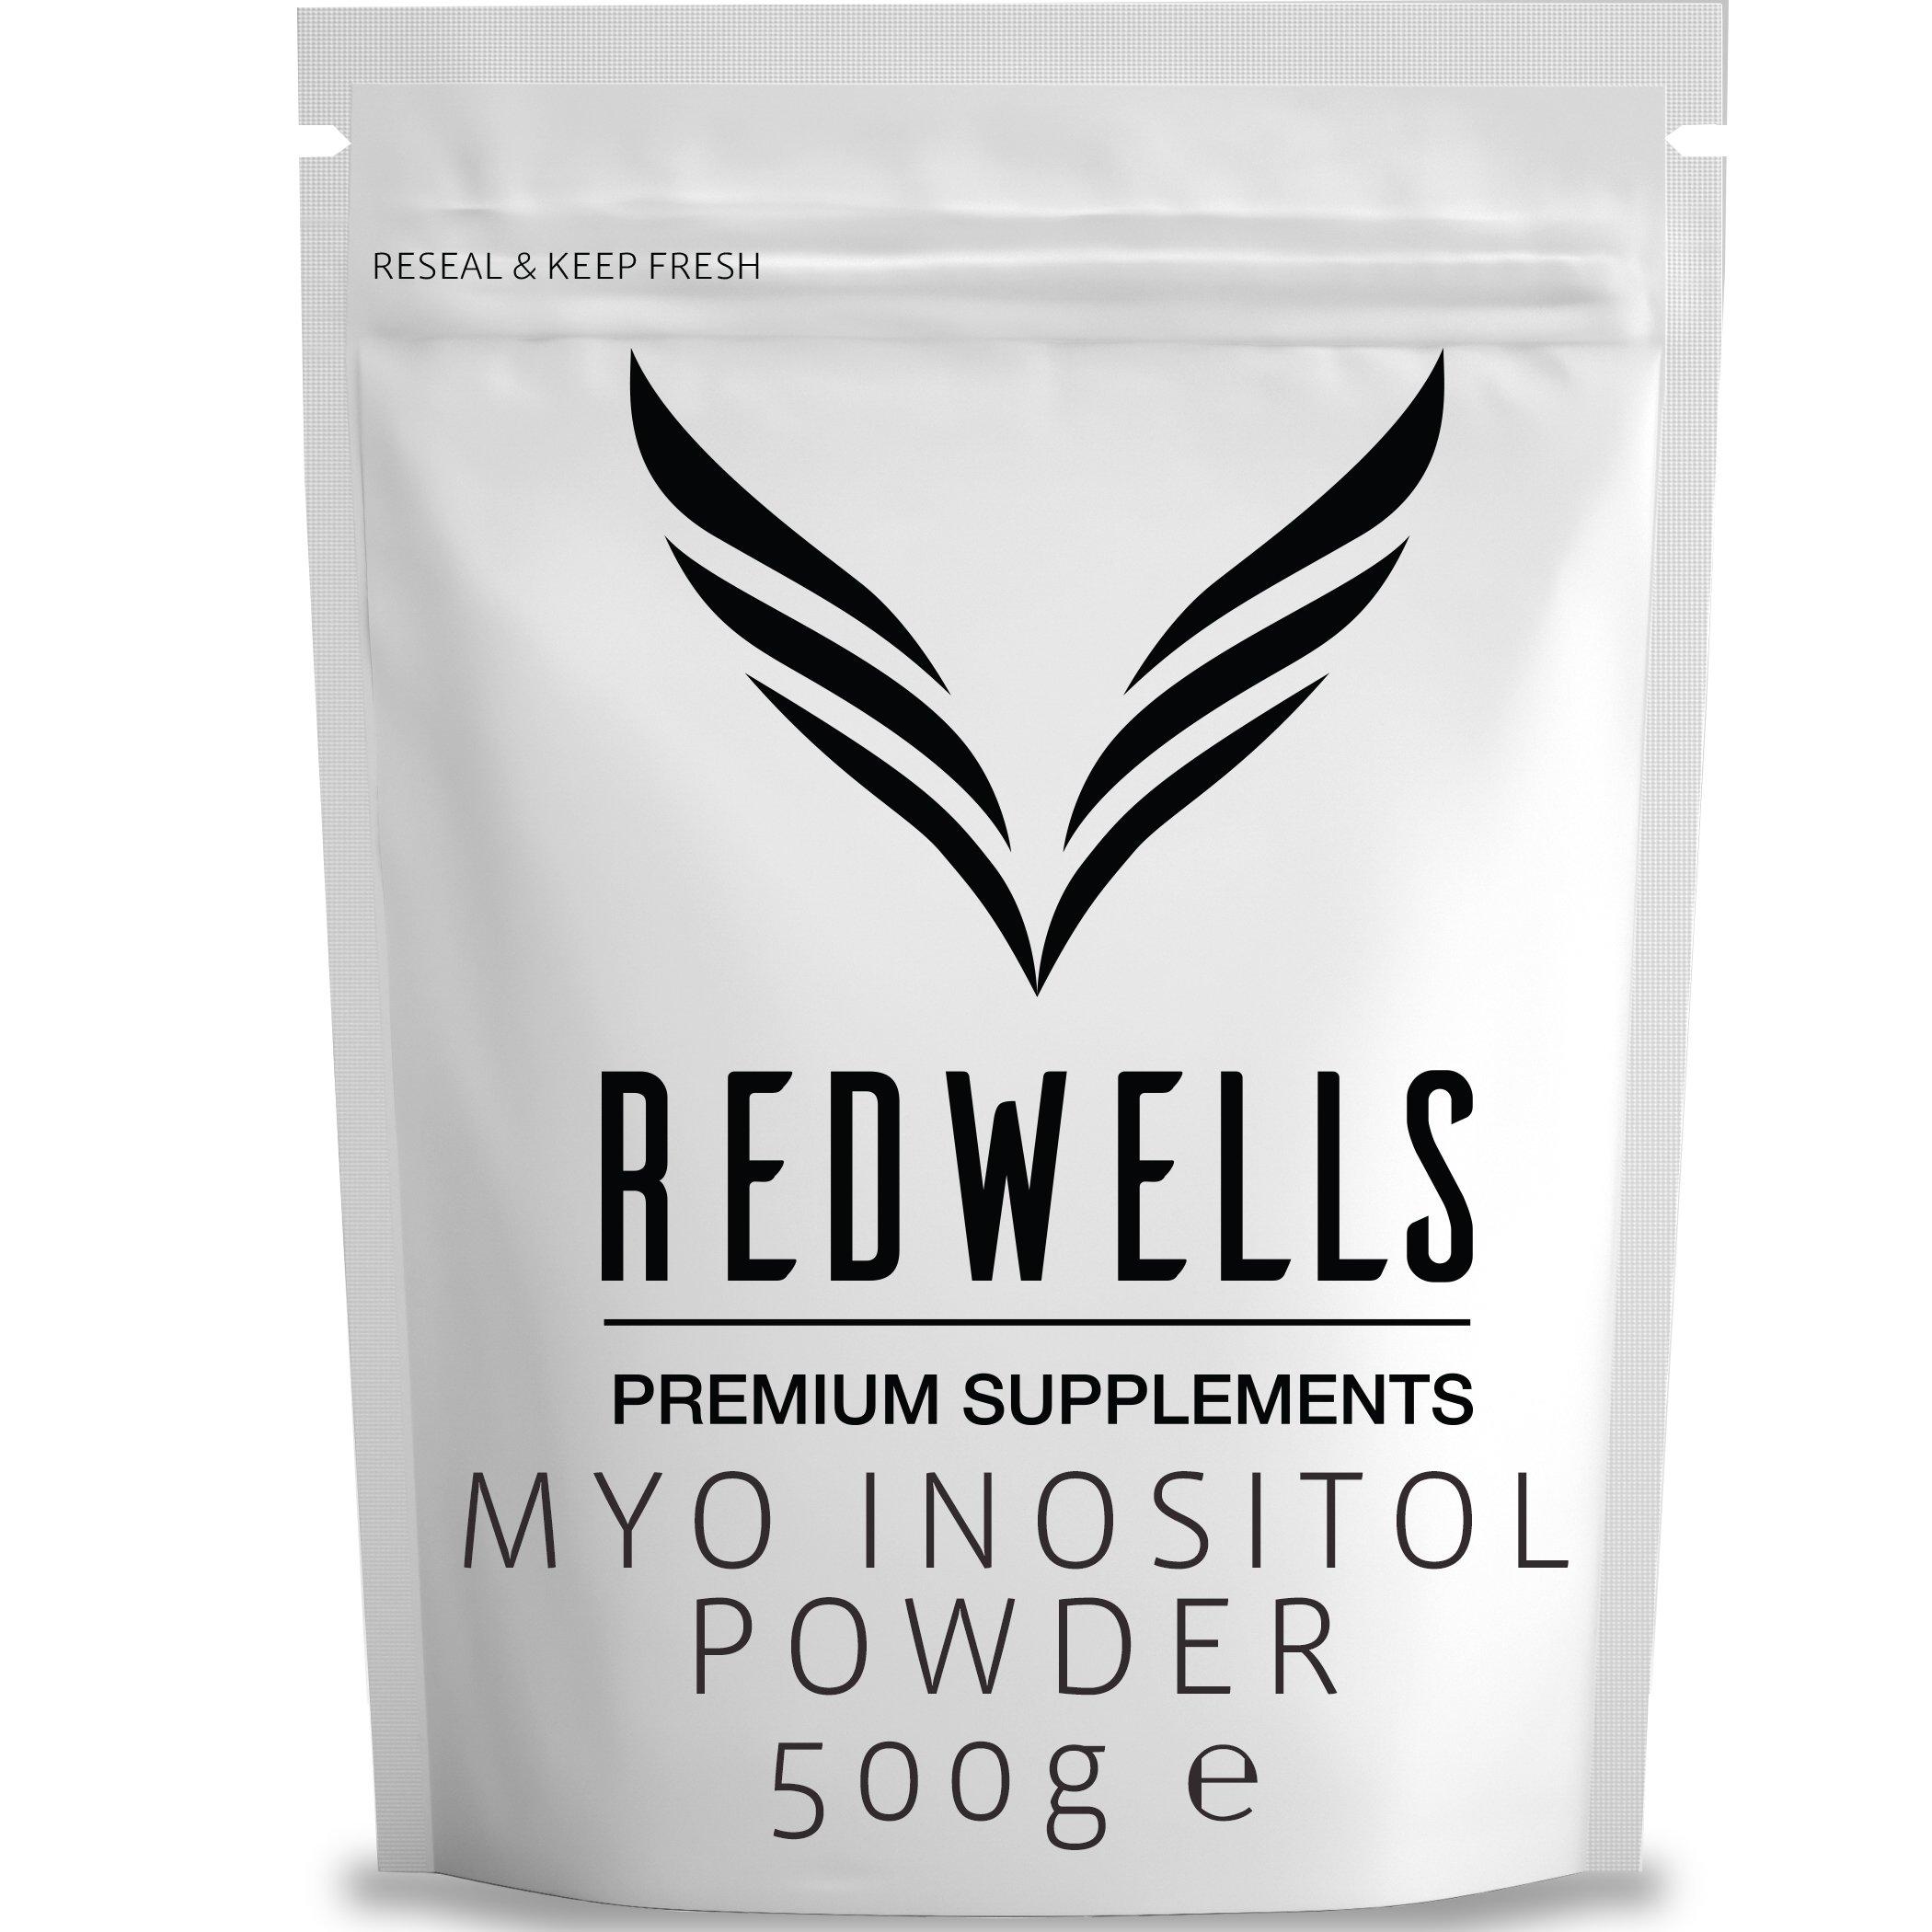 Pure Inositol Powder - 100g / 250g / 500g / 1kg - (500g) by Redwells Group